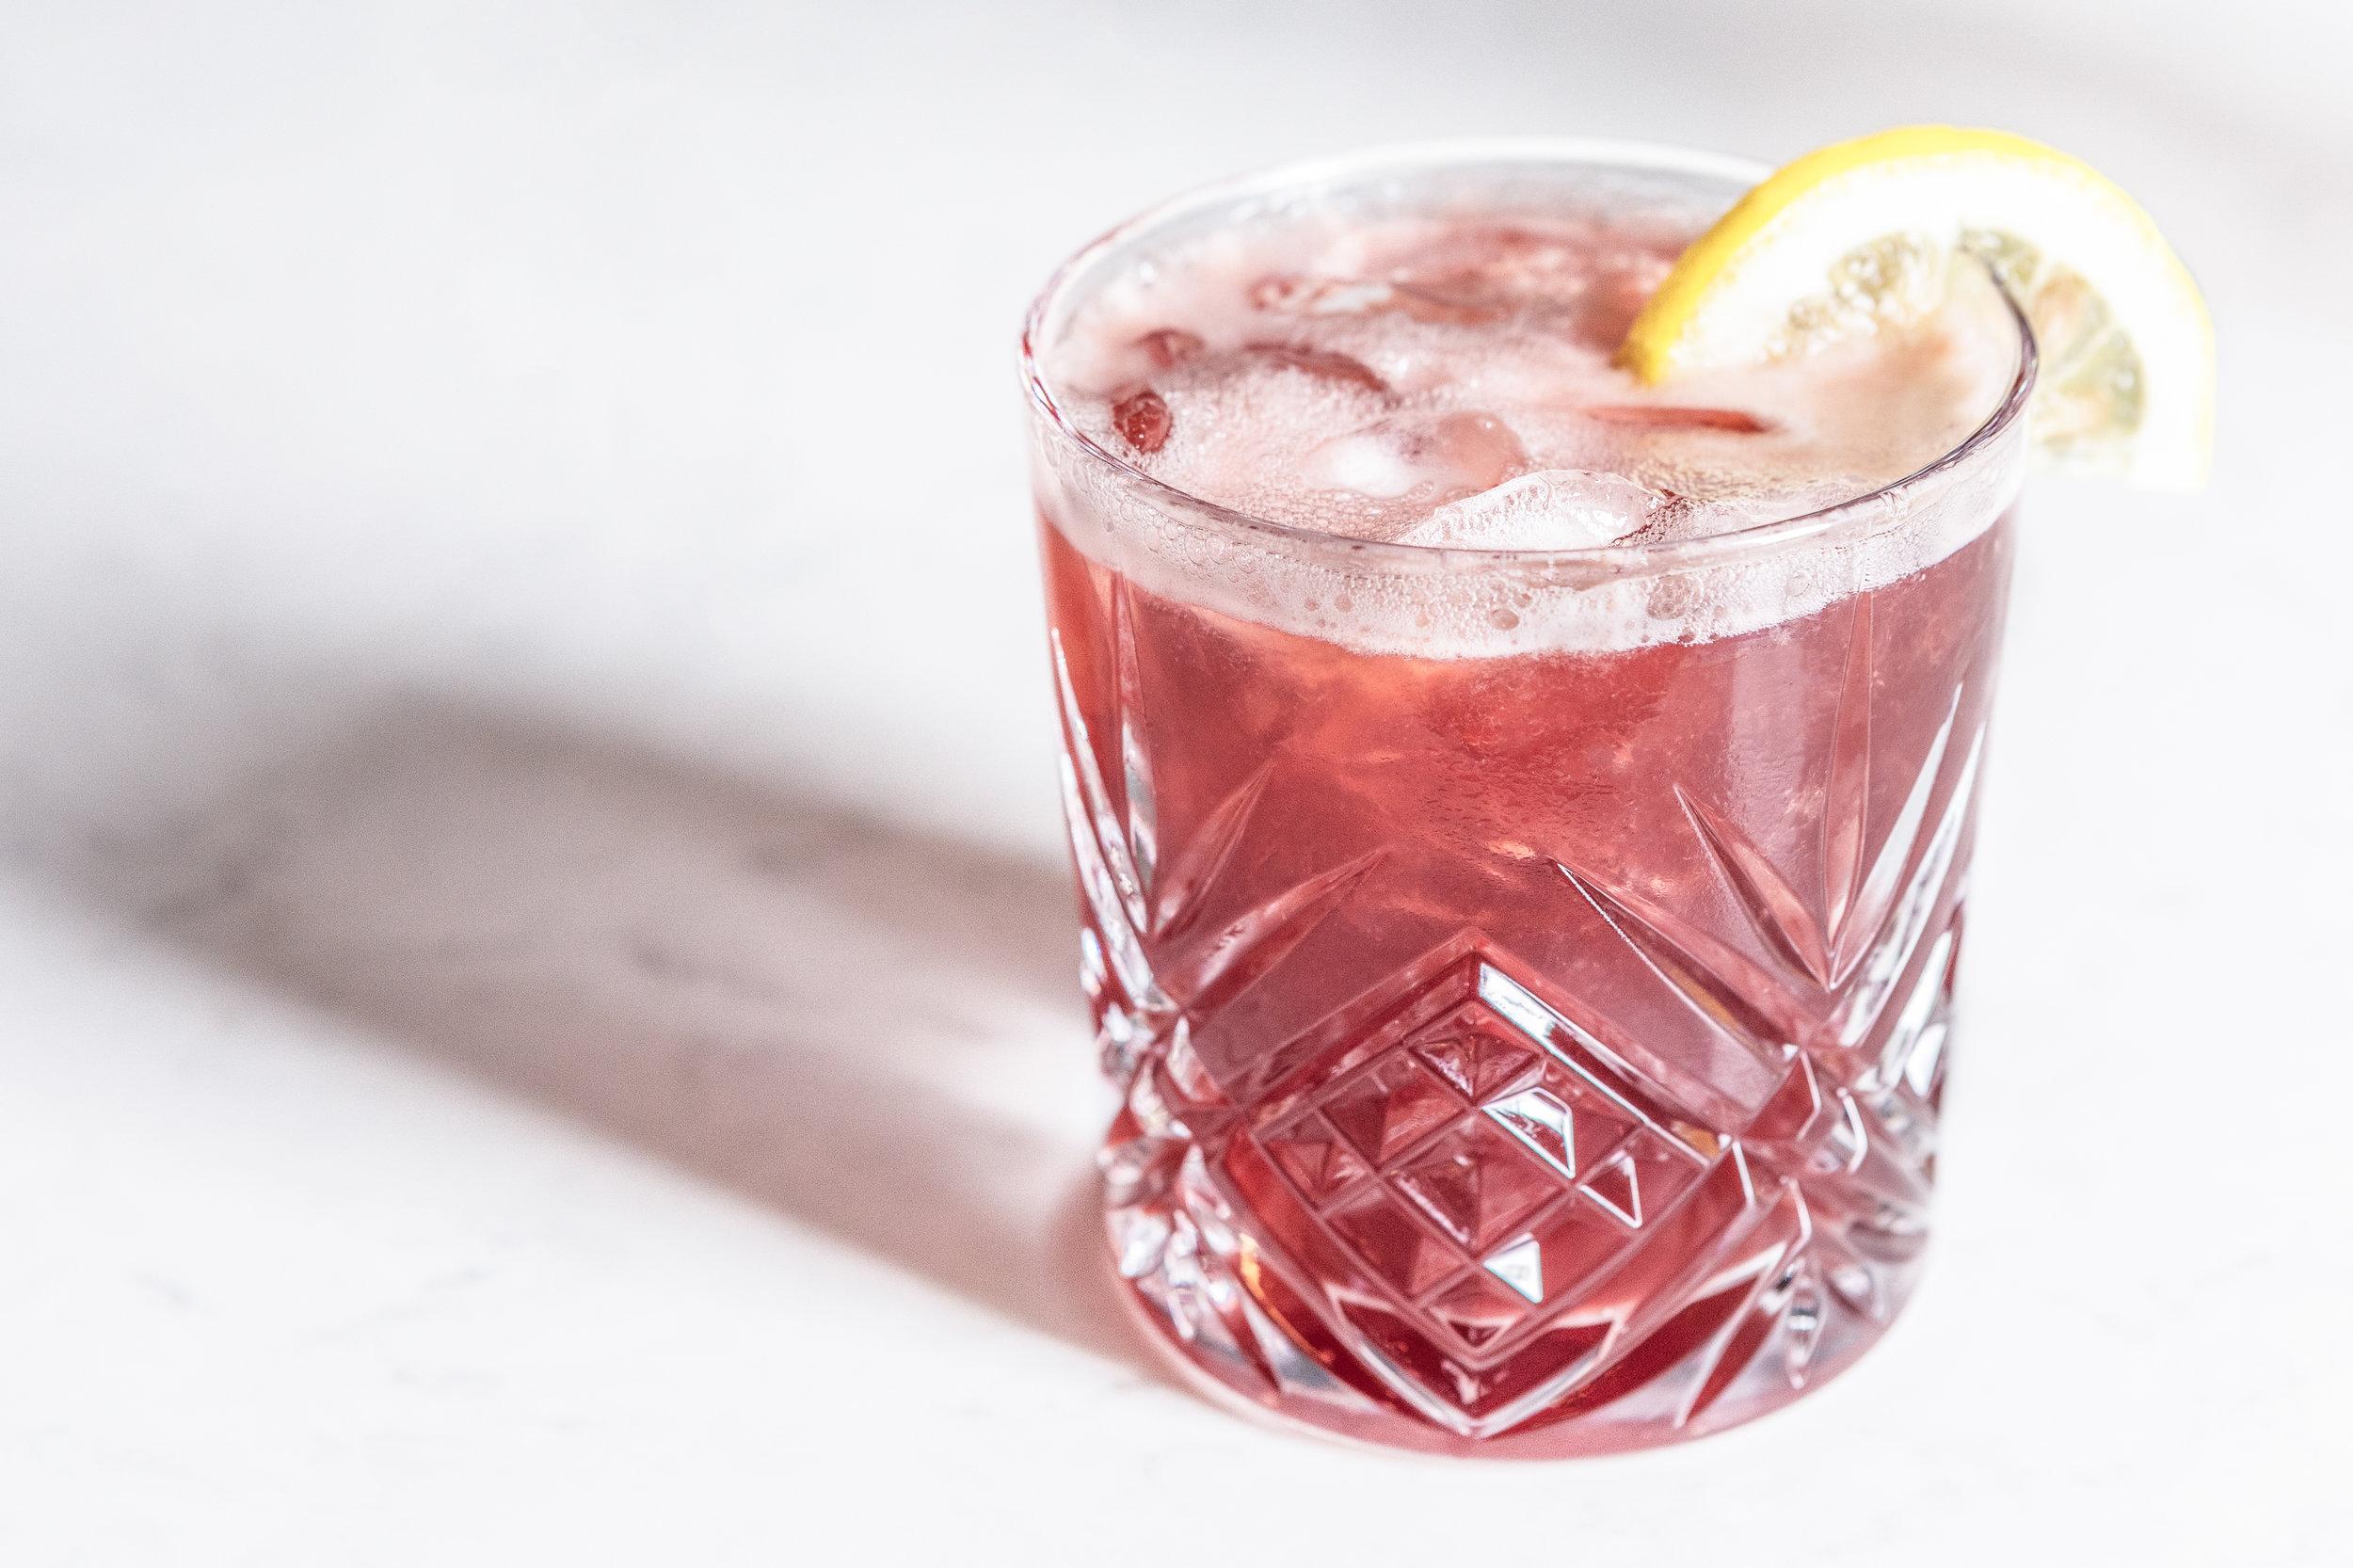 Image #3 - Wayward Son Cocktail.jpg